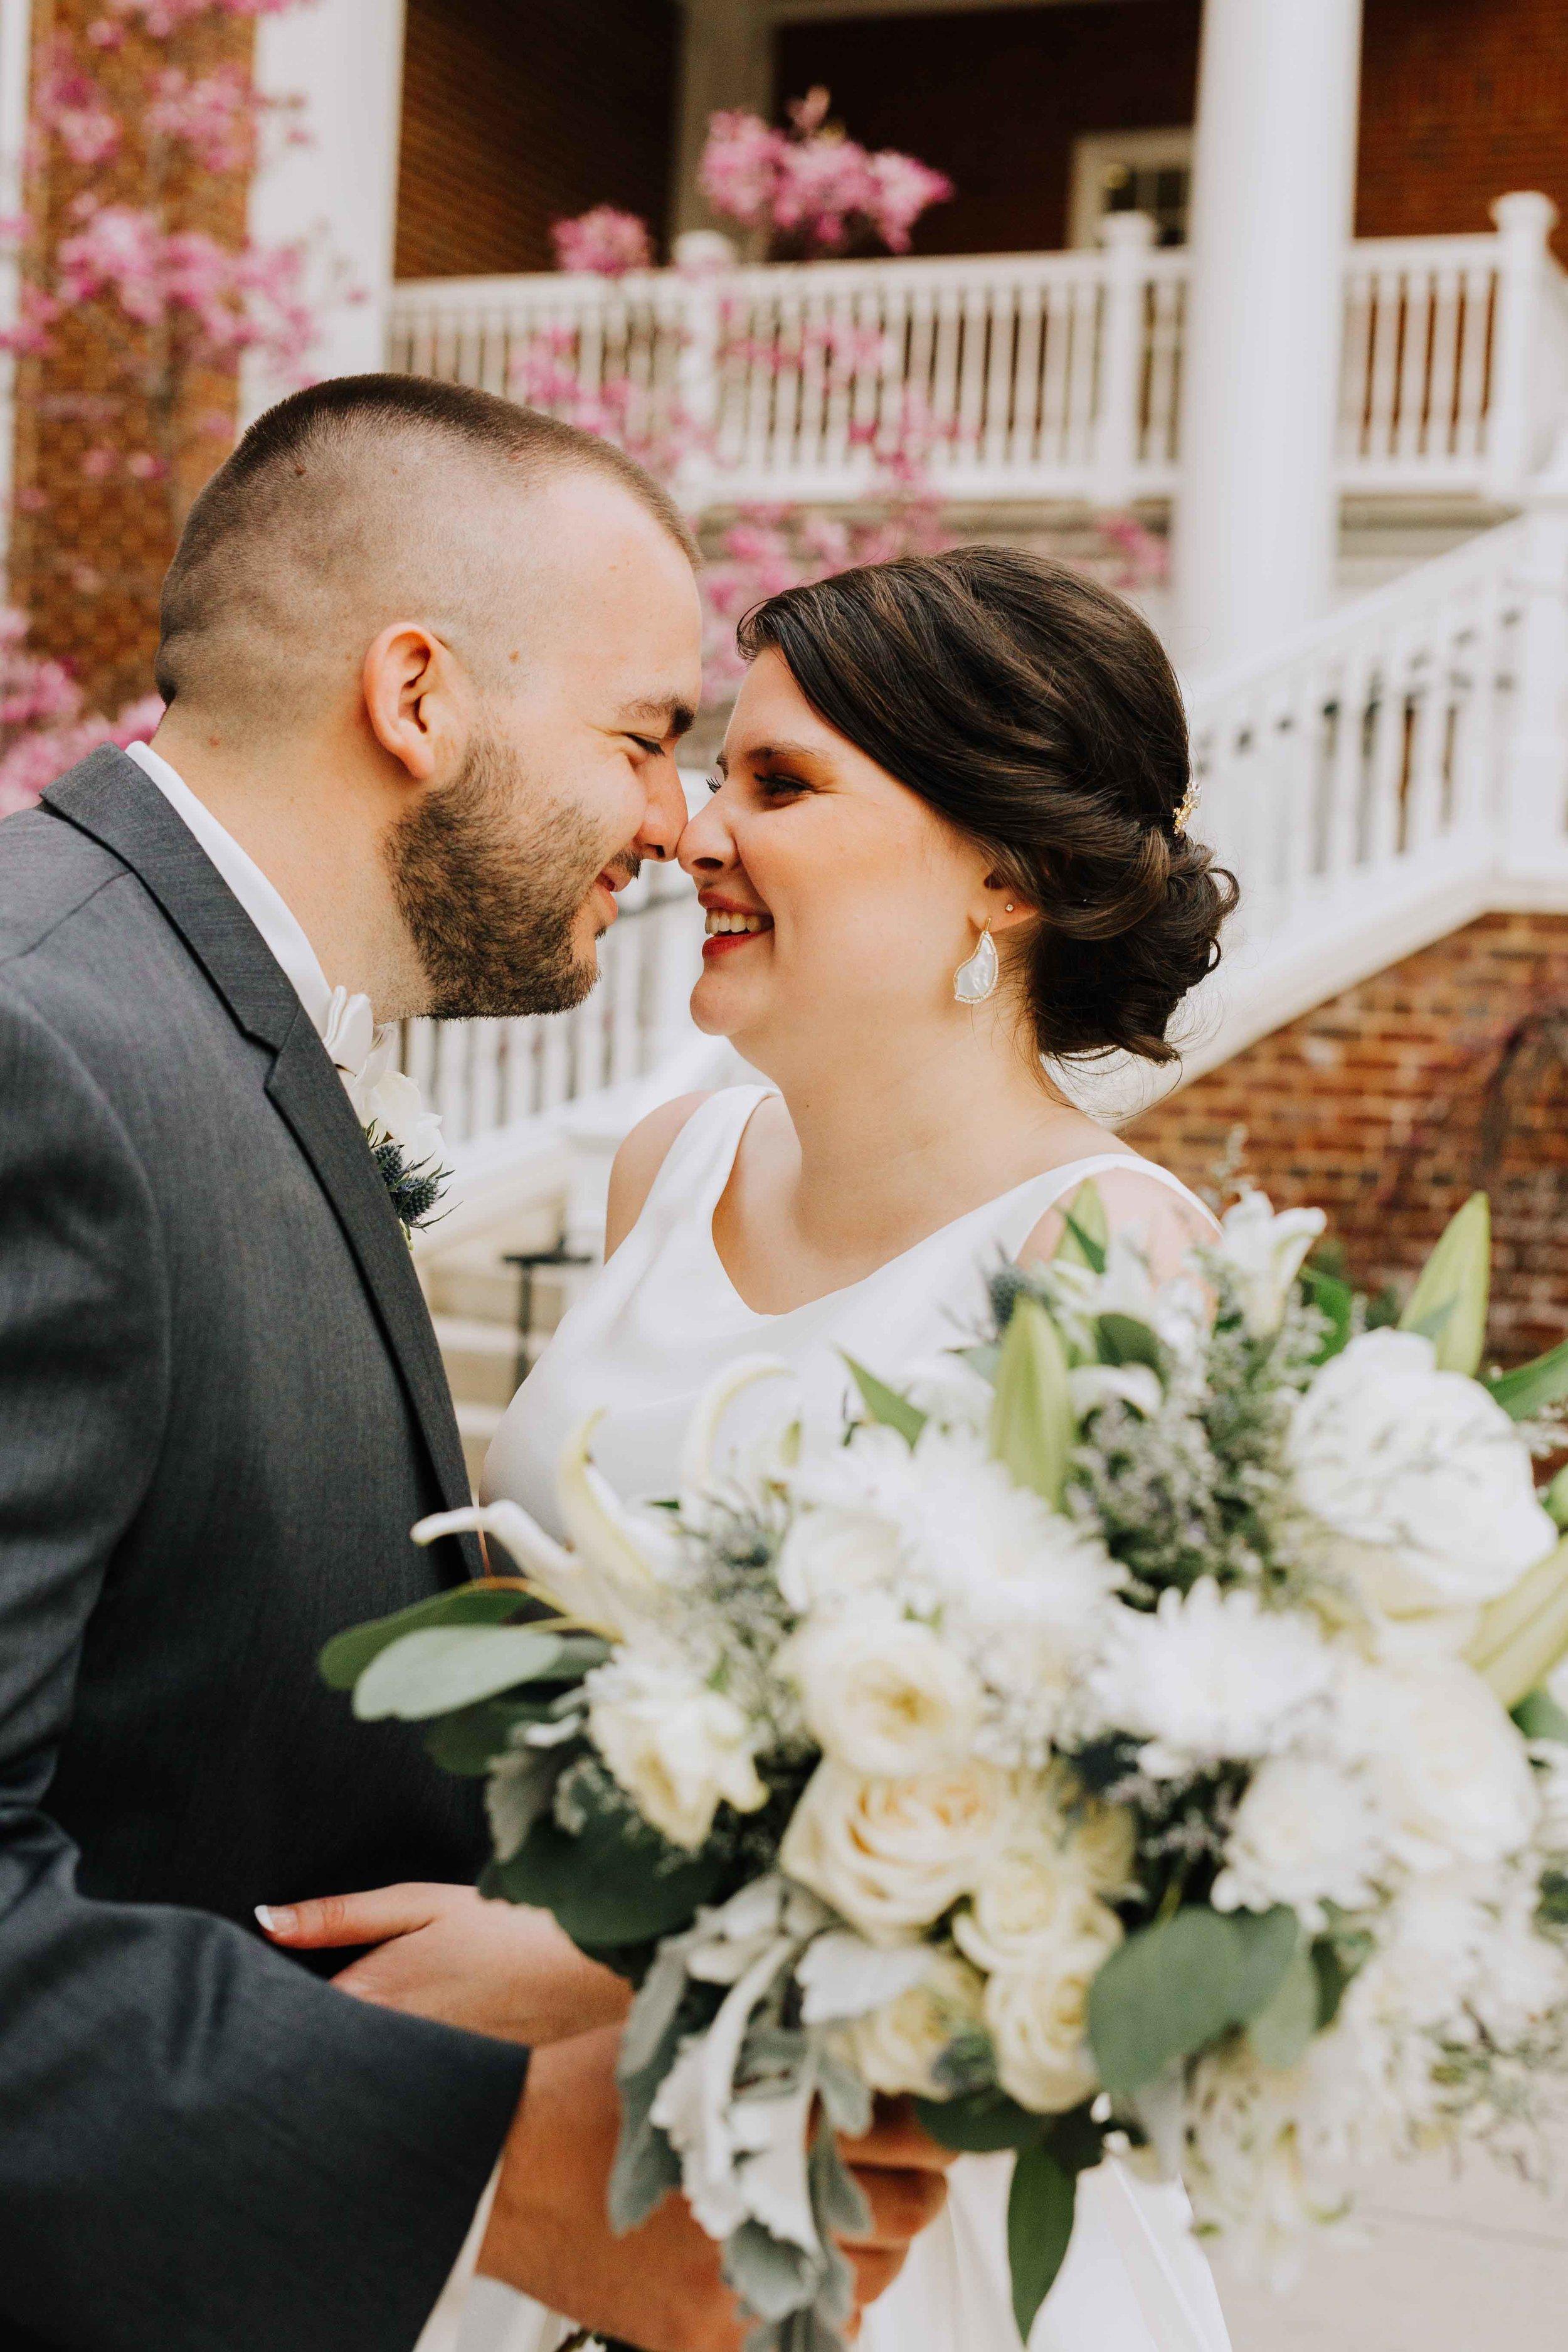 Farmville-Virginia-Wedding-Hotel-Weynoke-Downtown-Jacqueline-Waters-Photography-Detailed- (1220).jpg